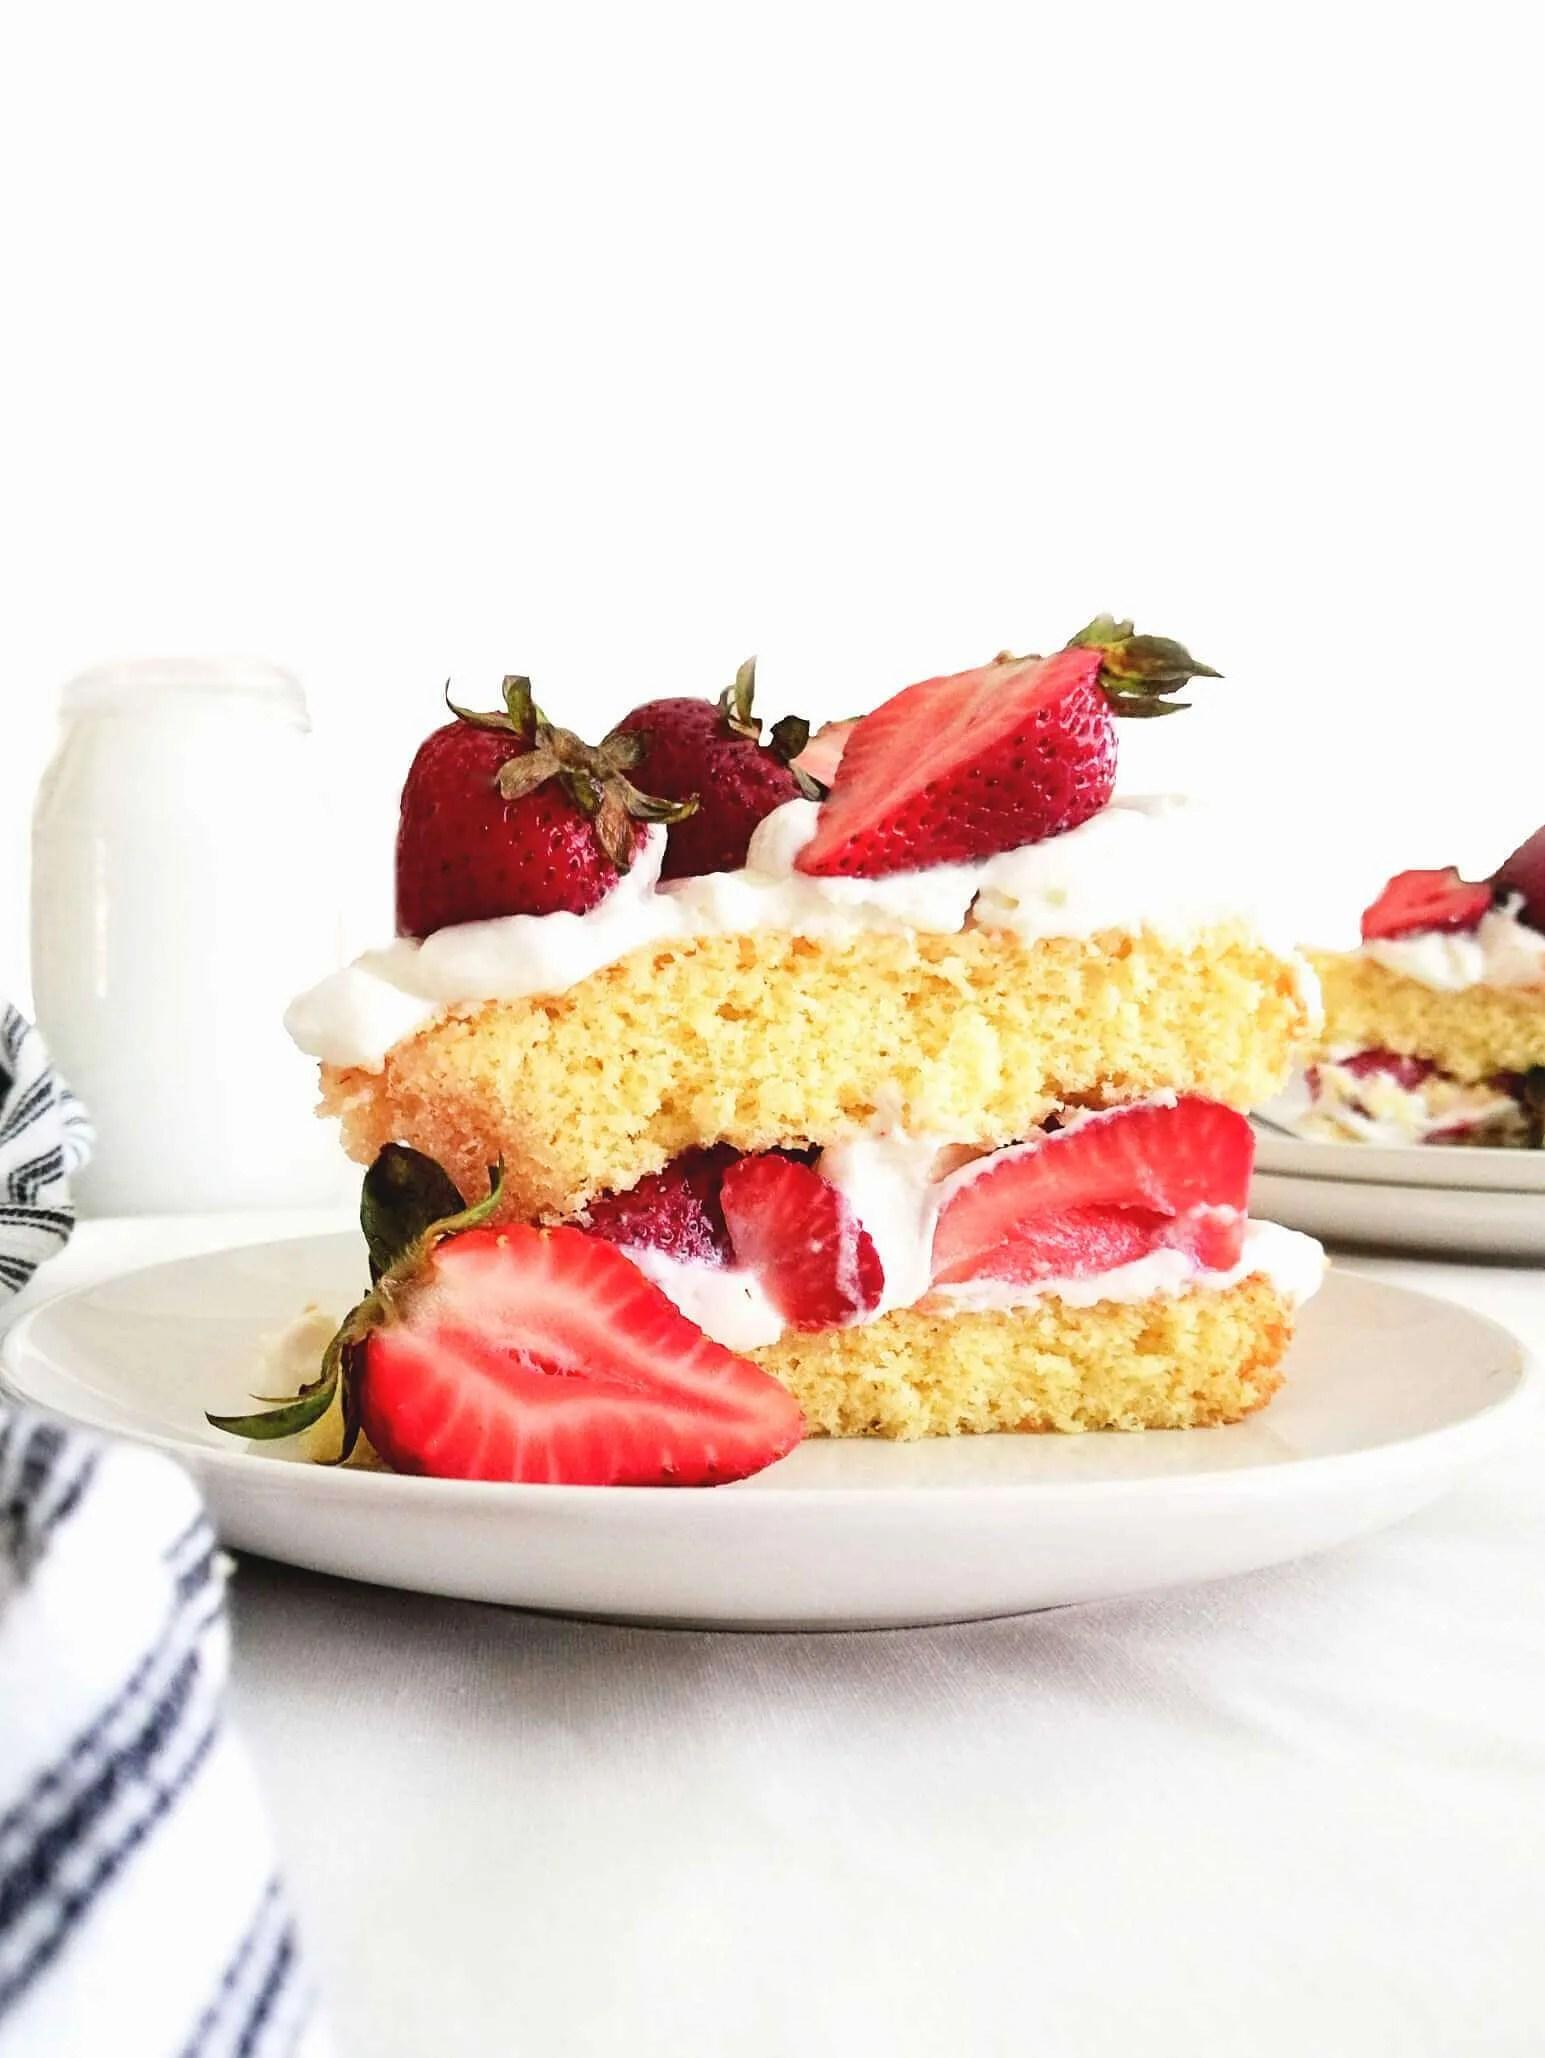 Strawberry Shortcake Cake (with Vanilla Sponge Cake)